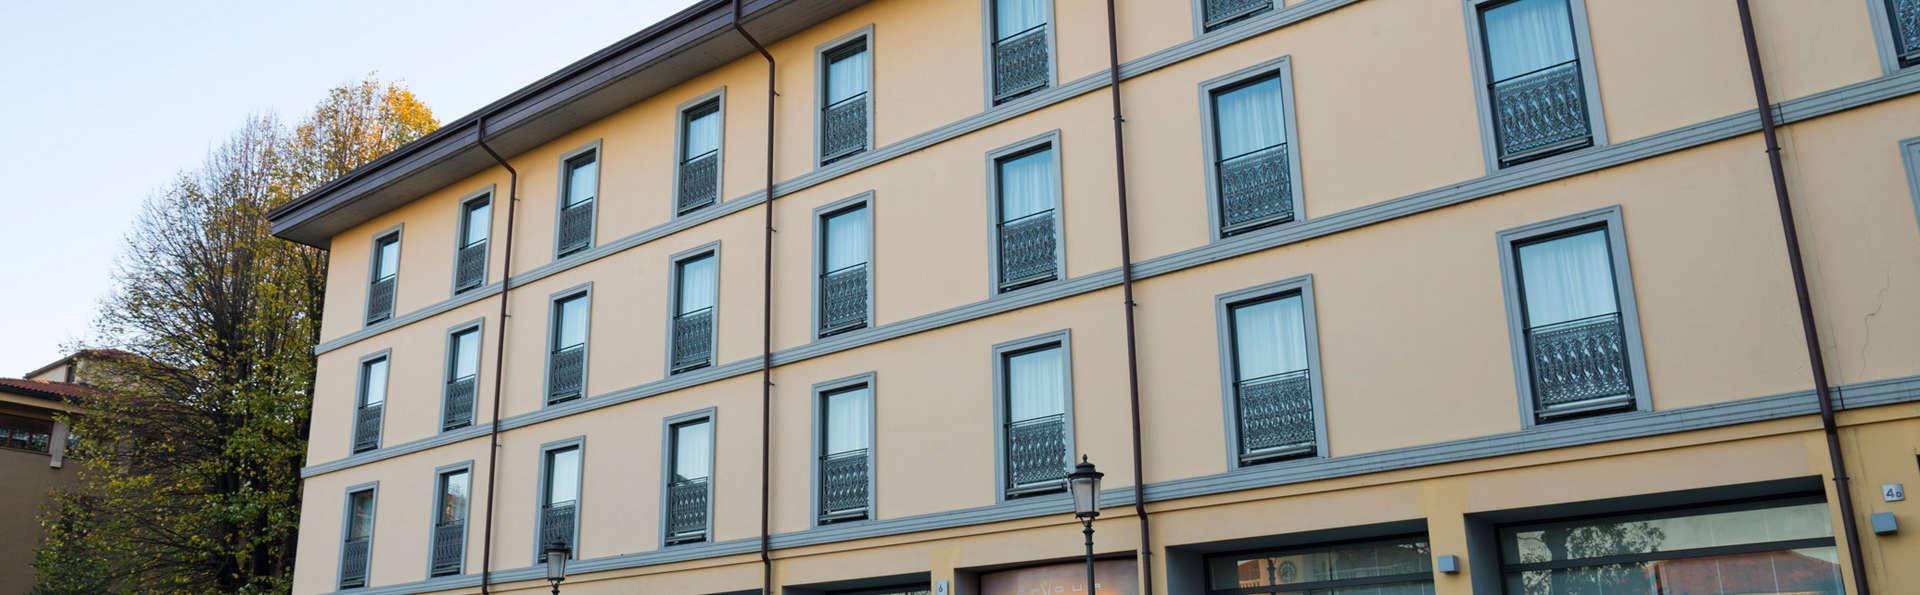 Hotel Cavour - EDIT_front.jpg